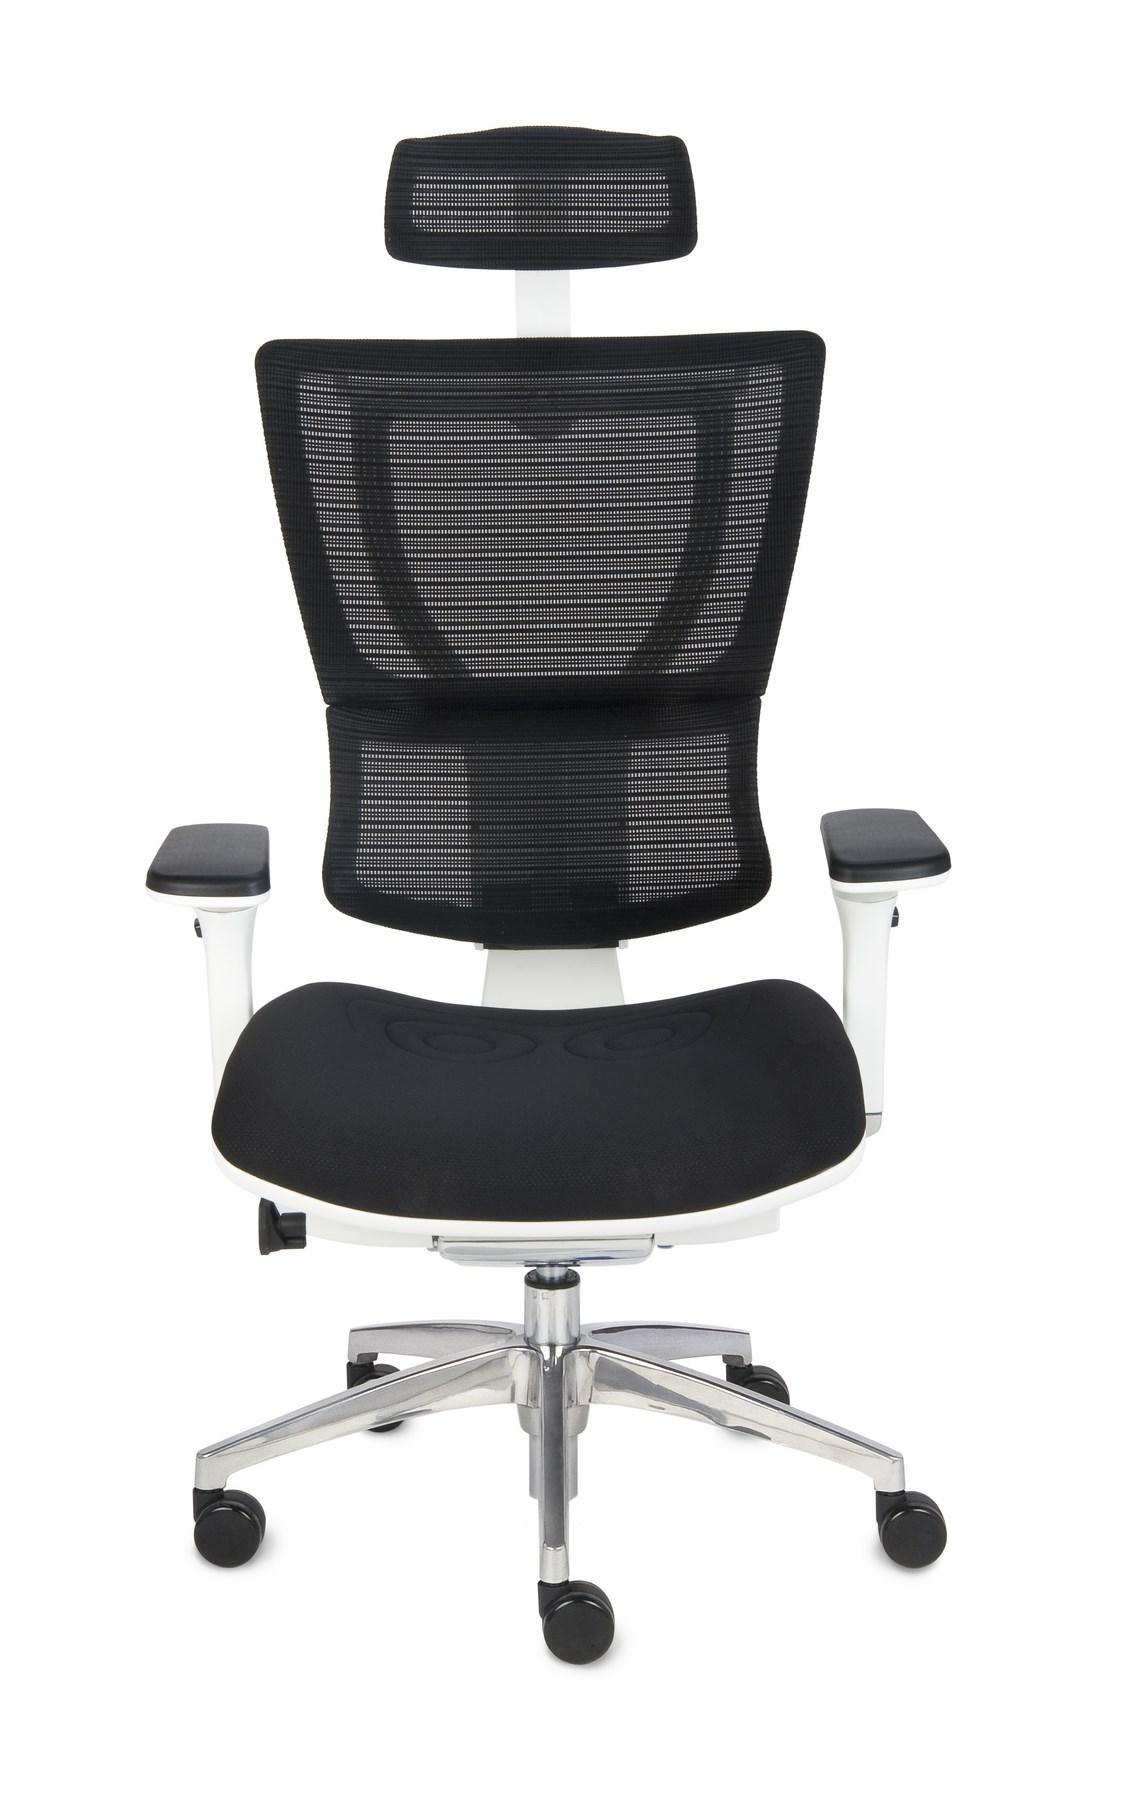 Fotel Ioo WT KMD31 - 24h